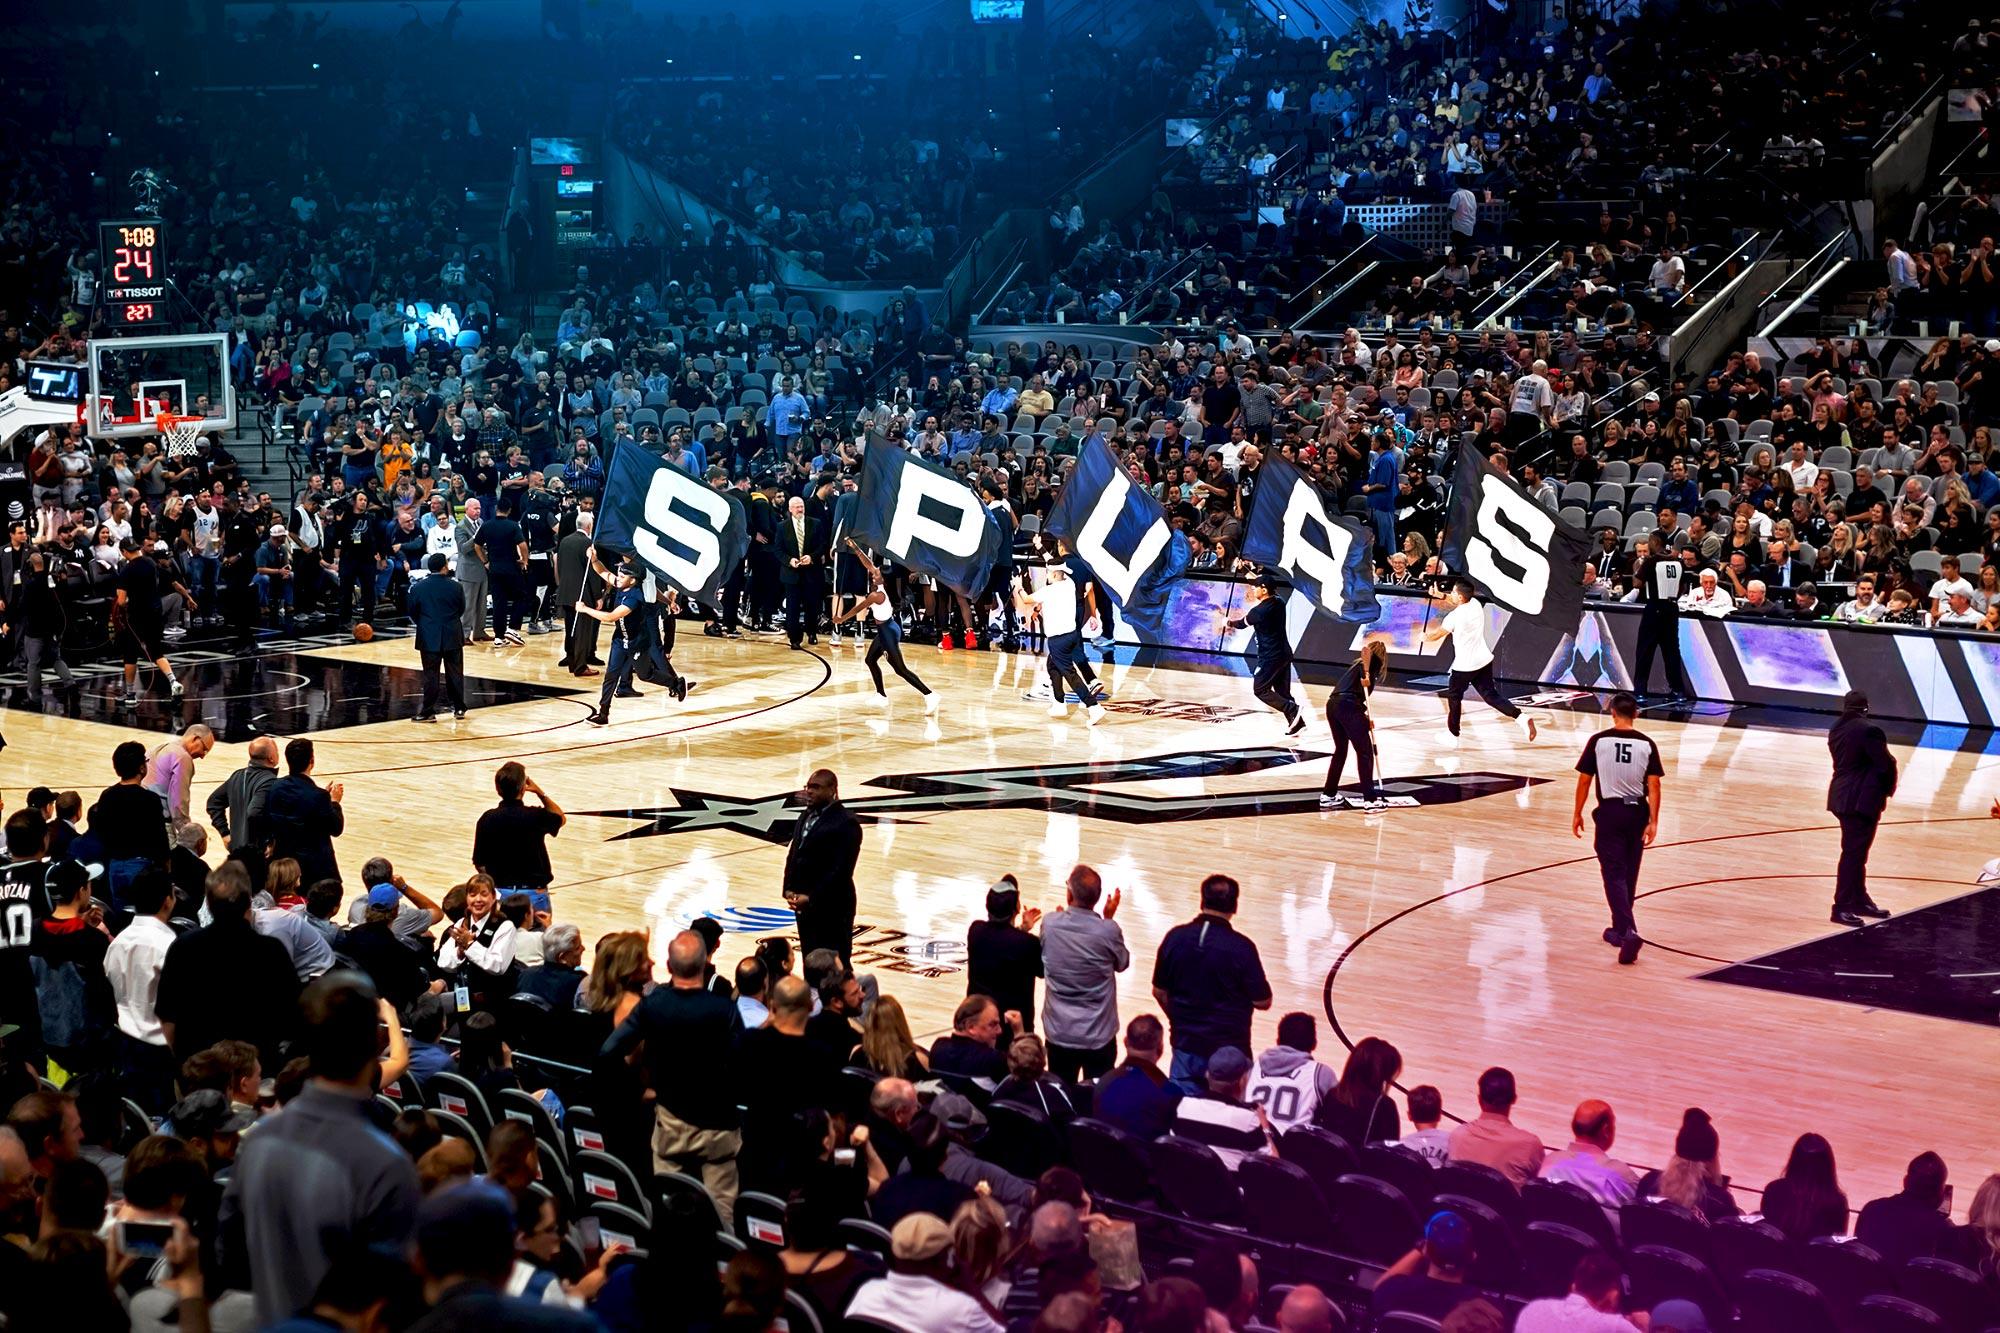 Spurs 8